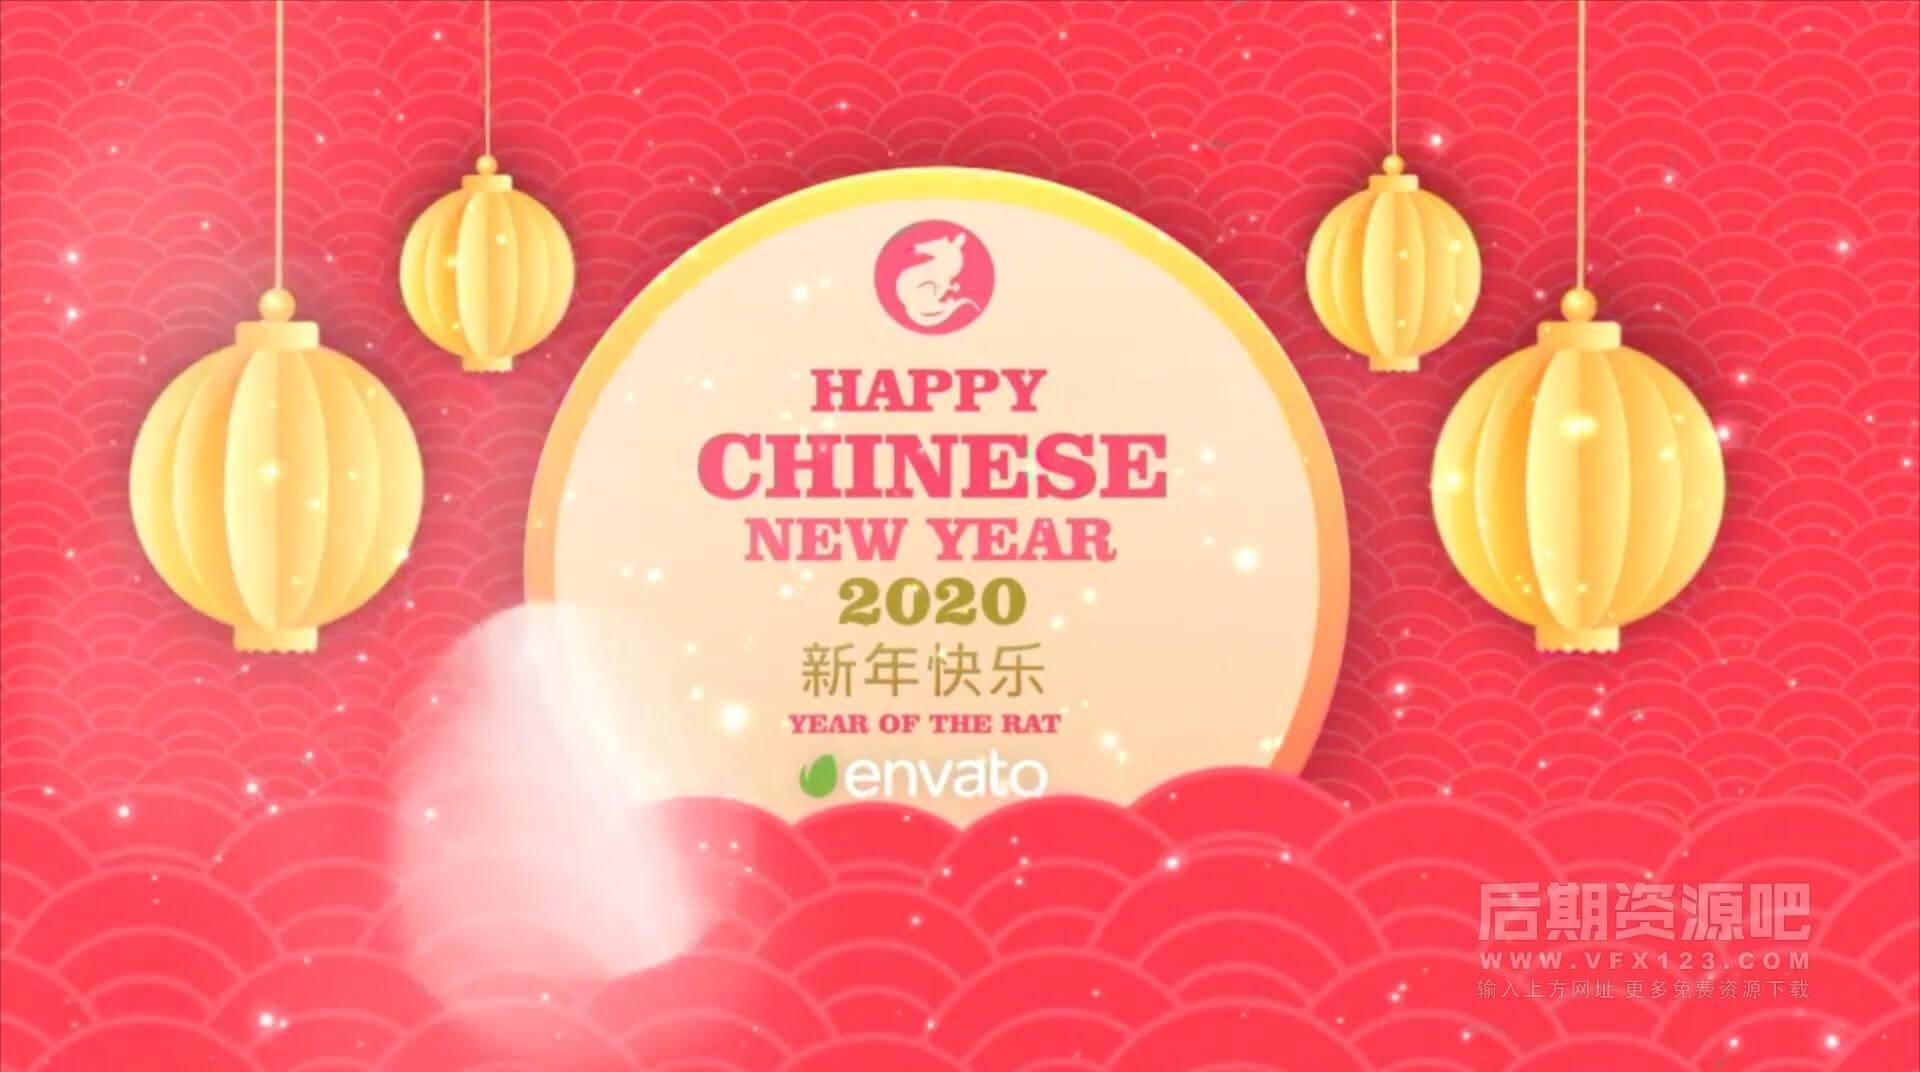 Ae模板 2020年中国新年喜庆灯笼开场片头 Chinese New Year 2020